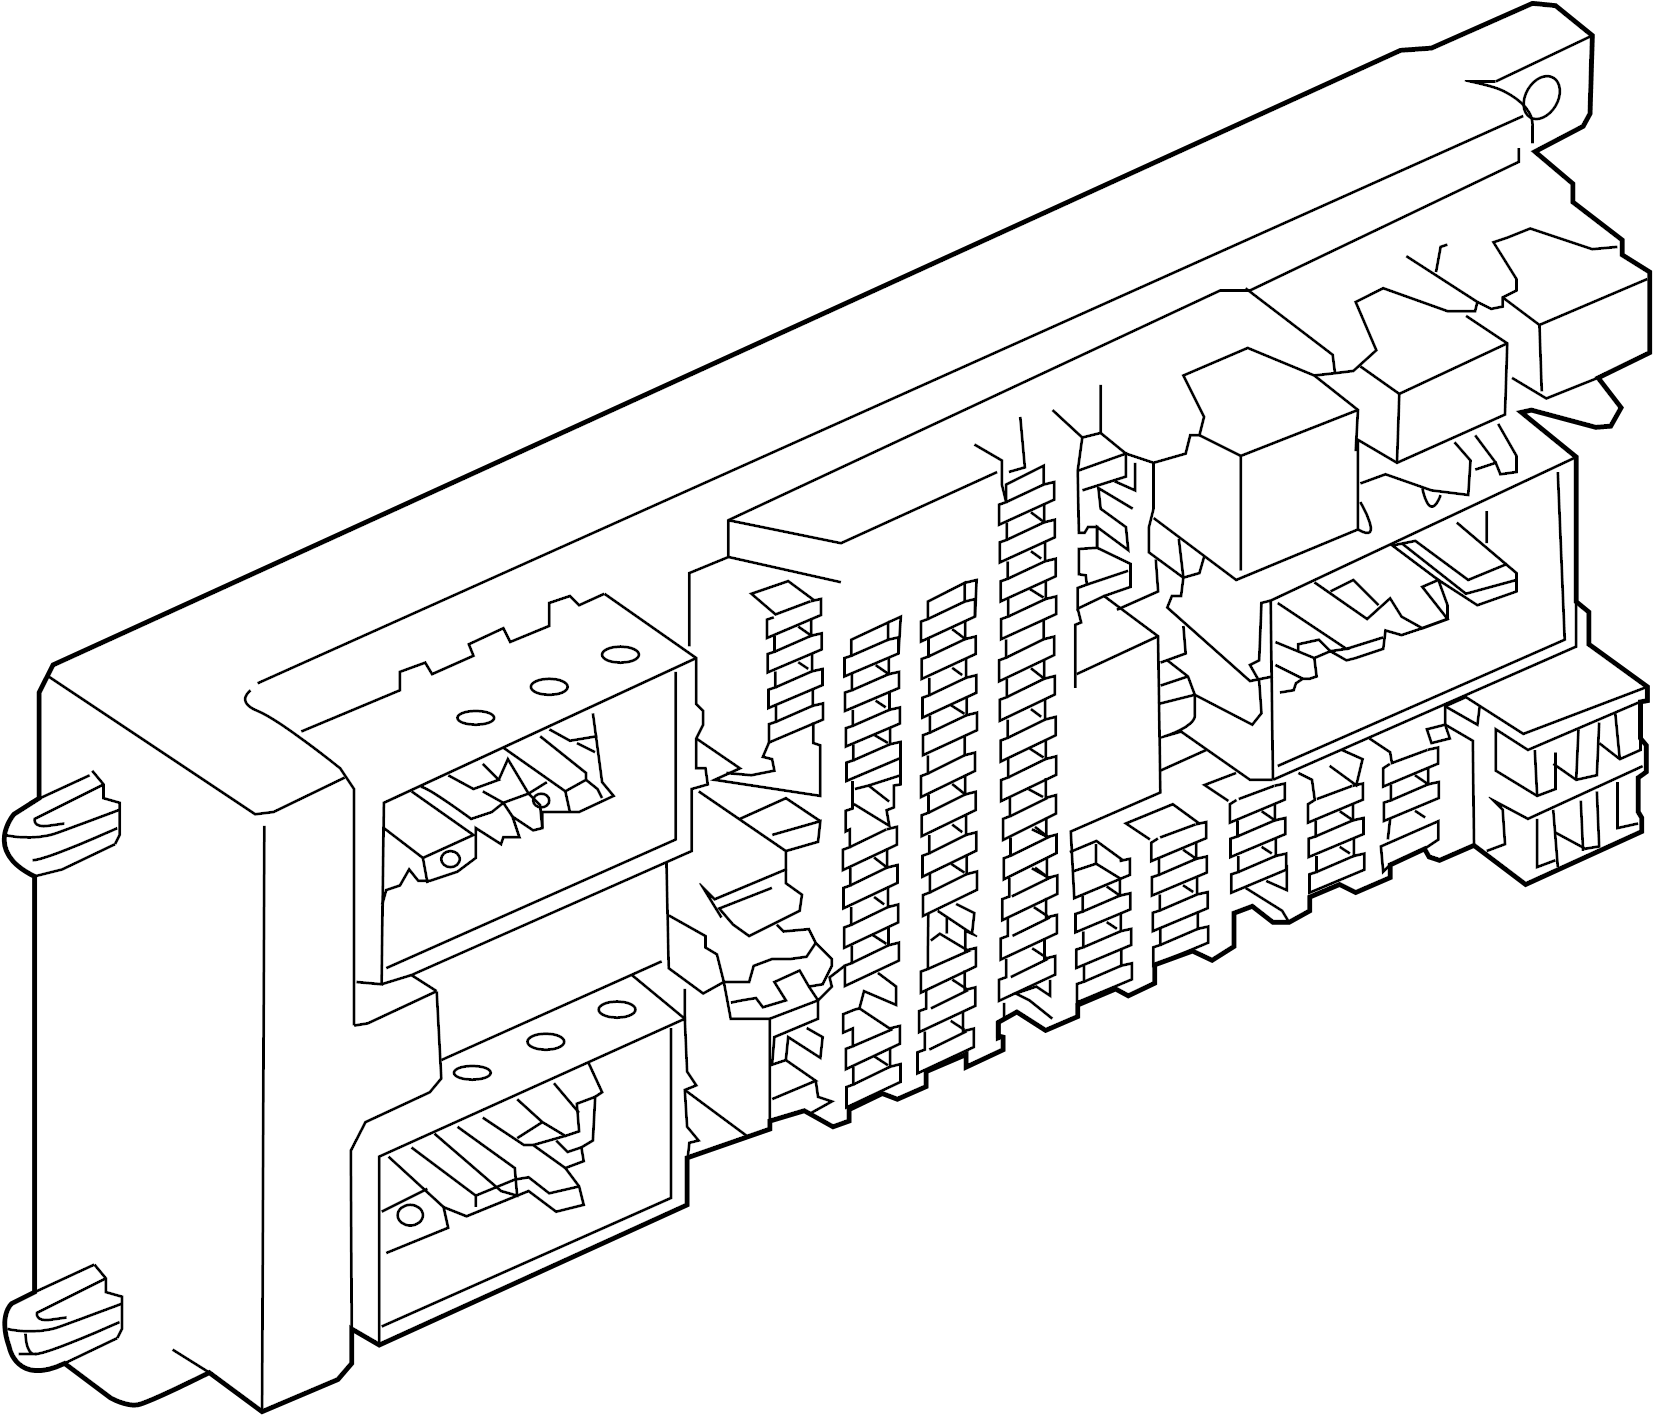 2019 land rover range rover sport fuse box  module